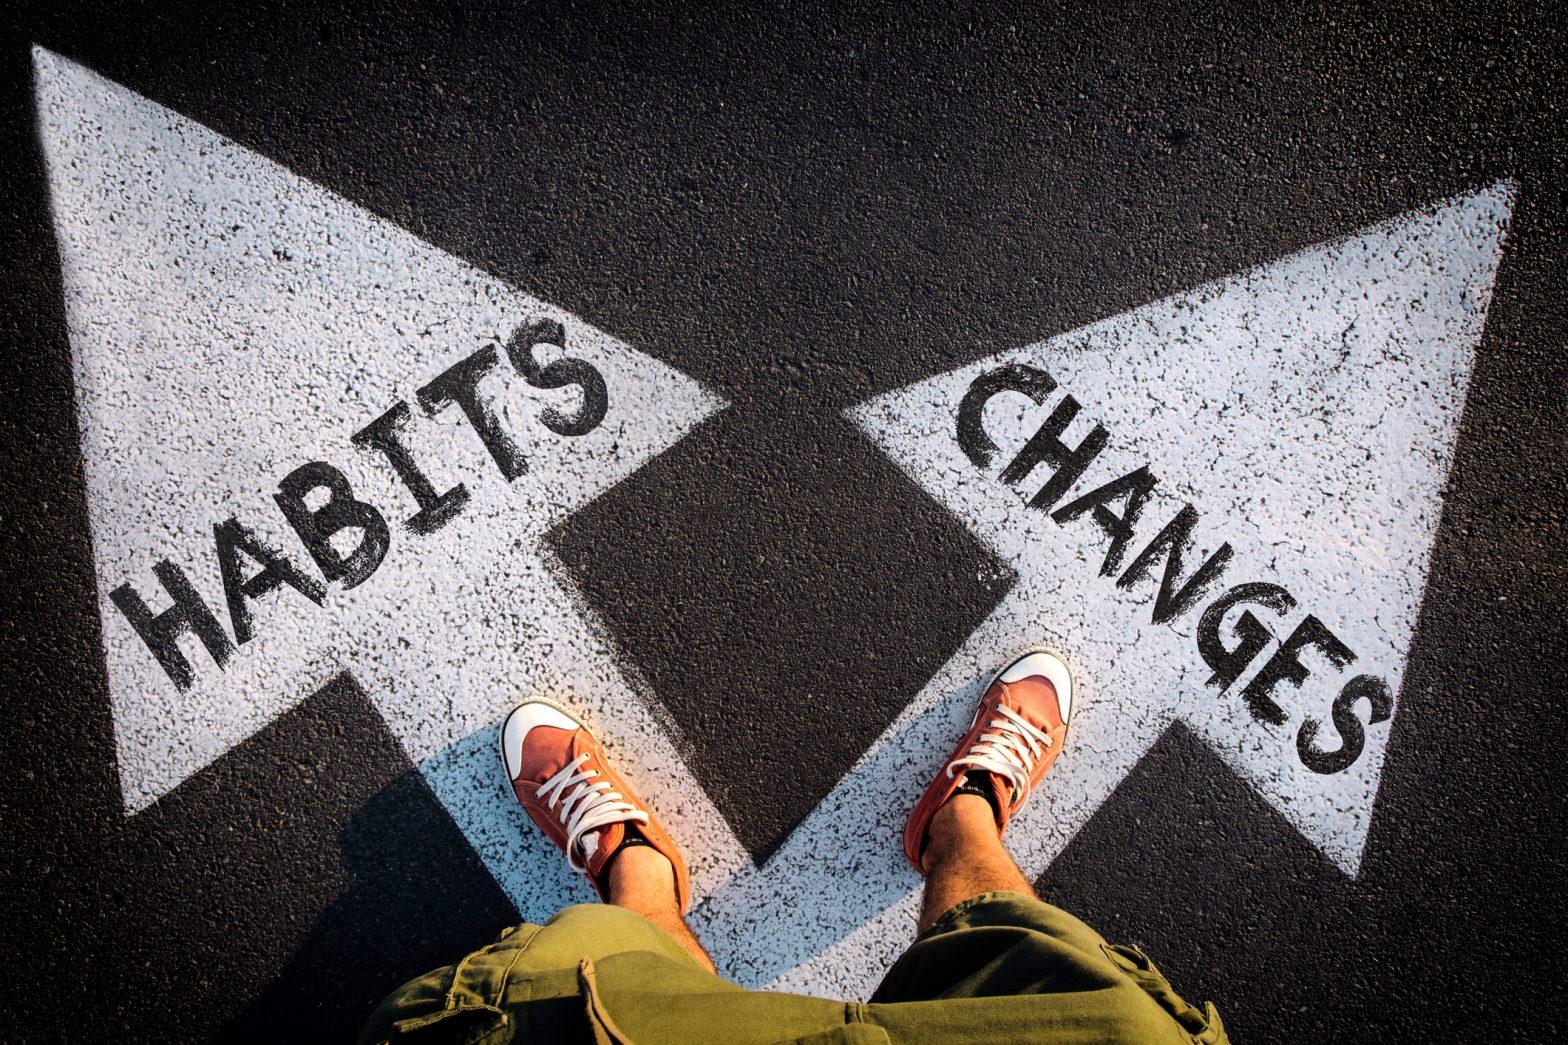 changes or habits